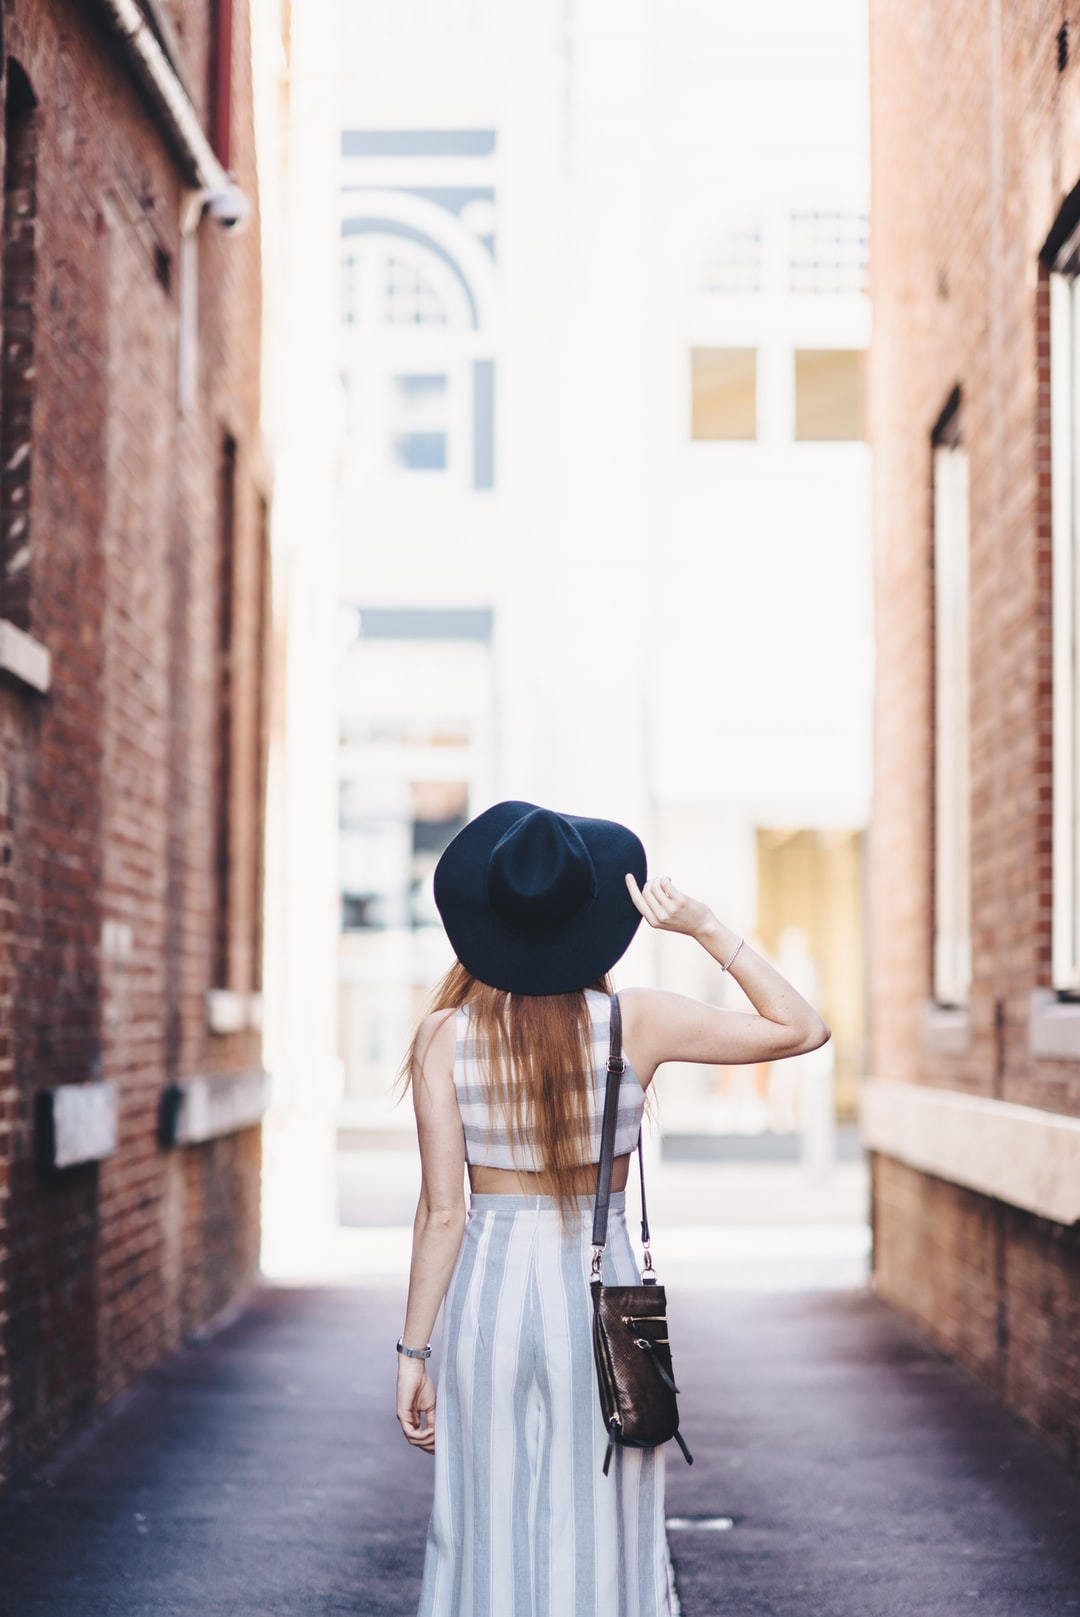 Woman in alleyway in Perth